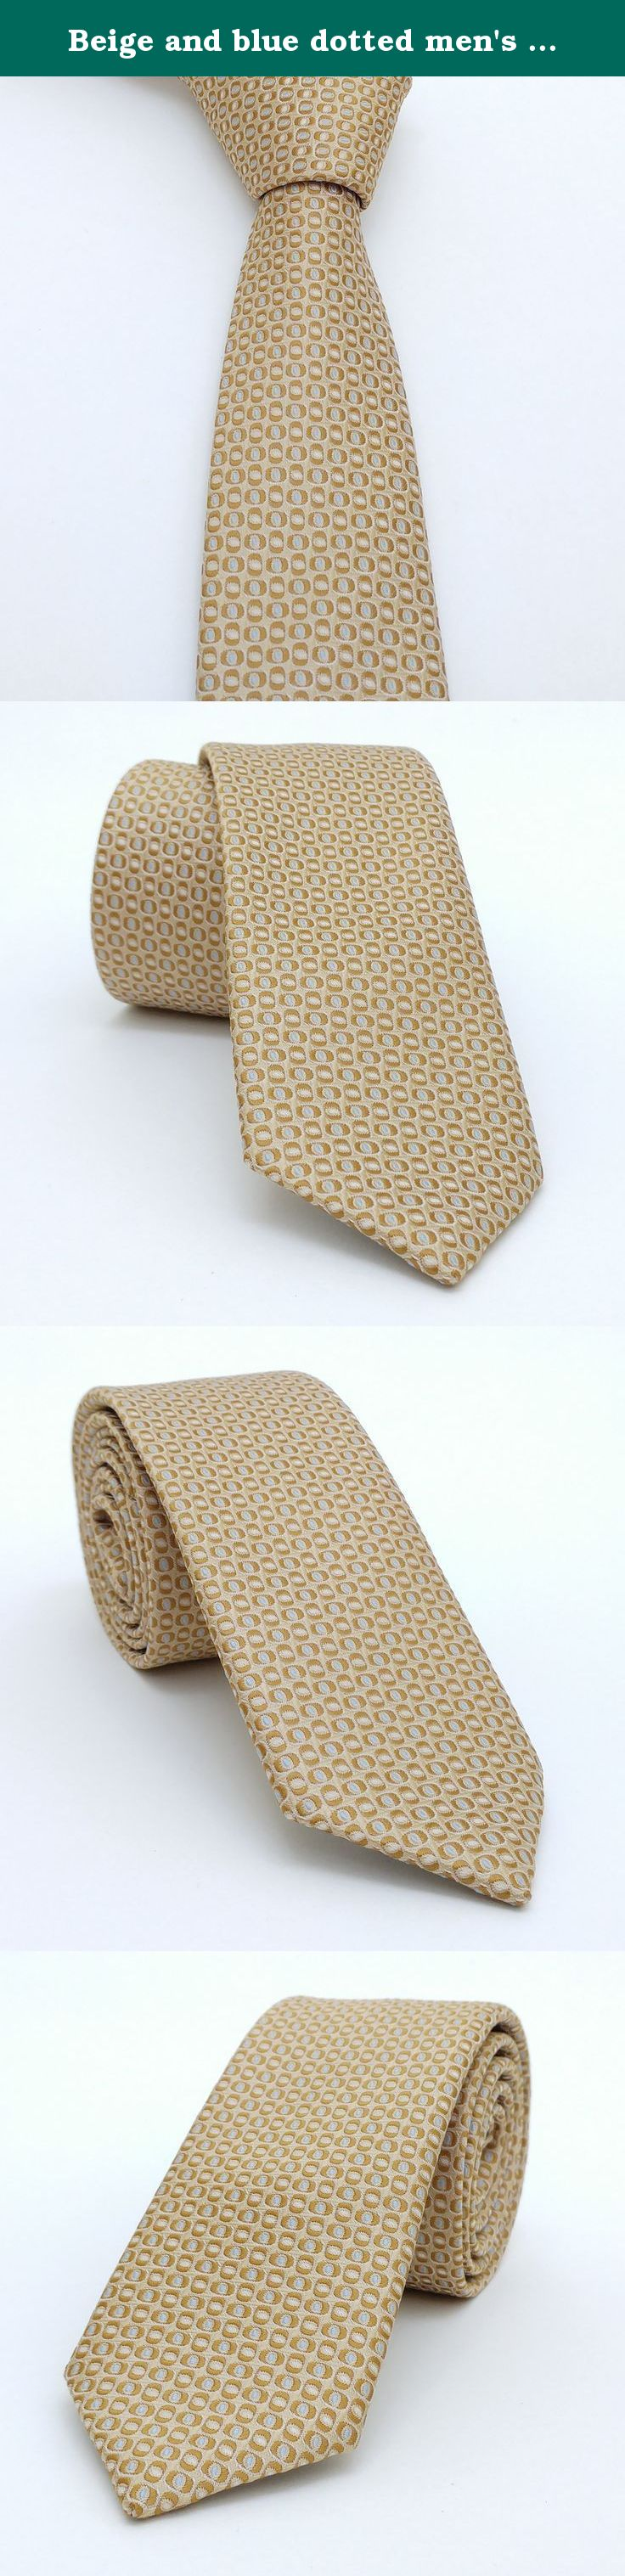 "Beige and blue dotted men's tie 6 cm (2,36"") DK-059. Beige and blue dotted men's necktie DK-059 Width : 6 cm (2,36"") Length : 150 cm (59,06"")."